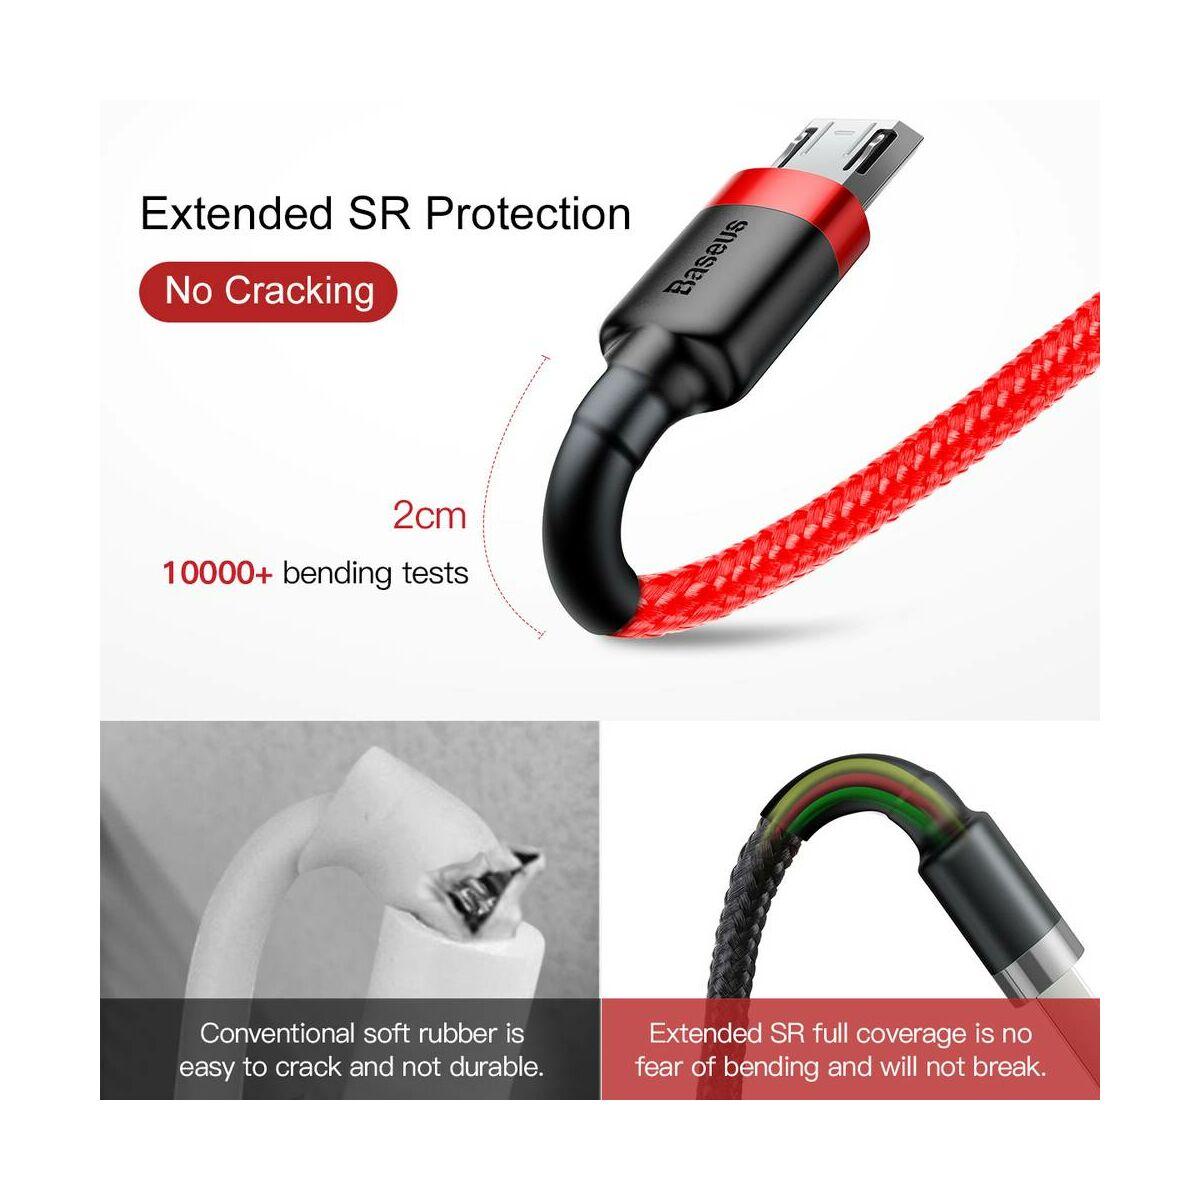 Baseus Micro USB kábel, Cafule 2.4A, 1m, piros/piros (CAMKLF-B09)